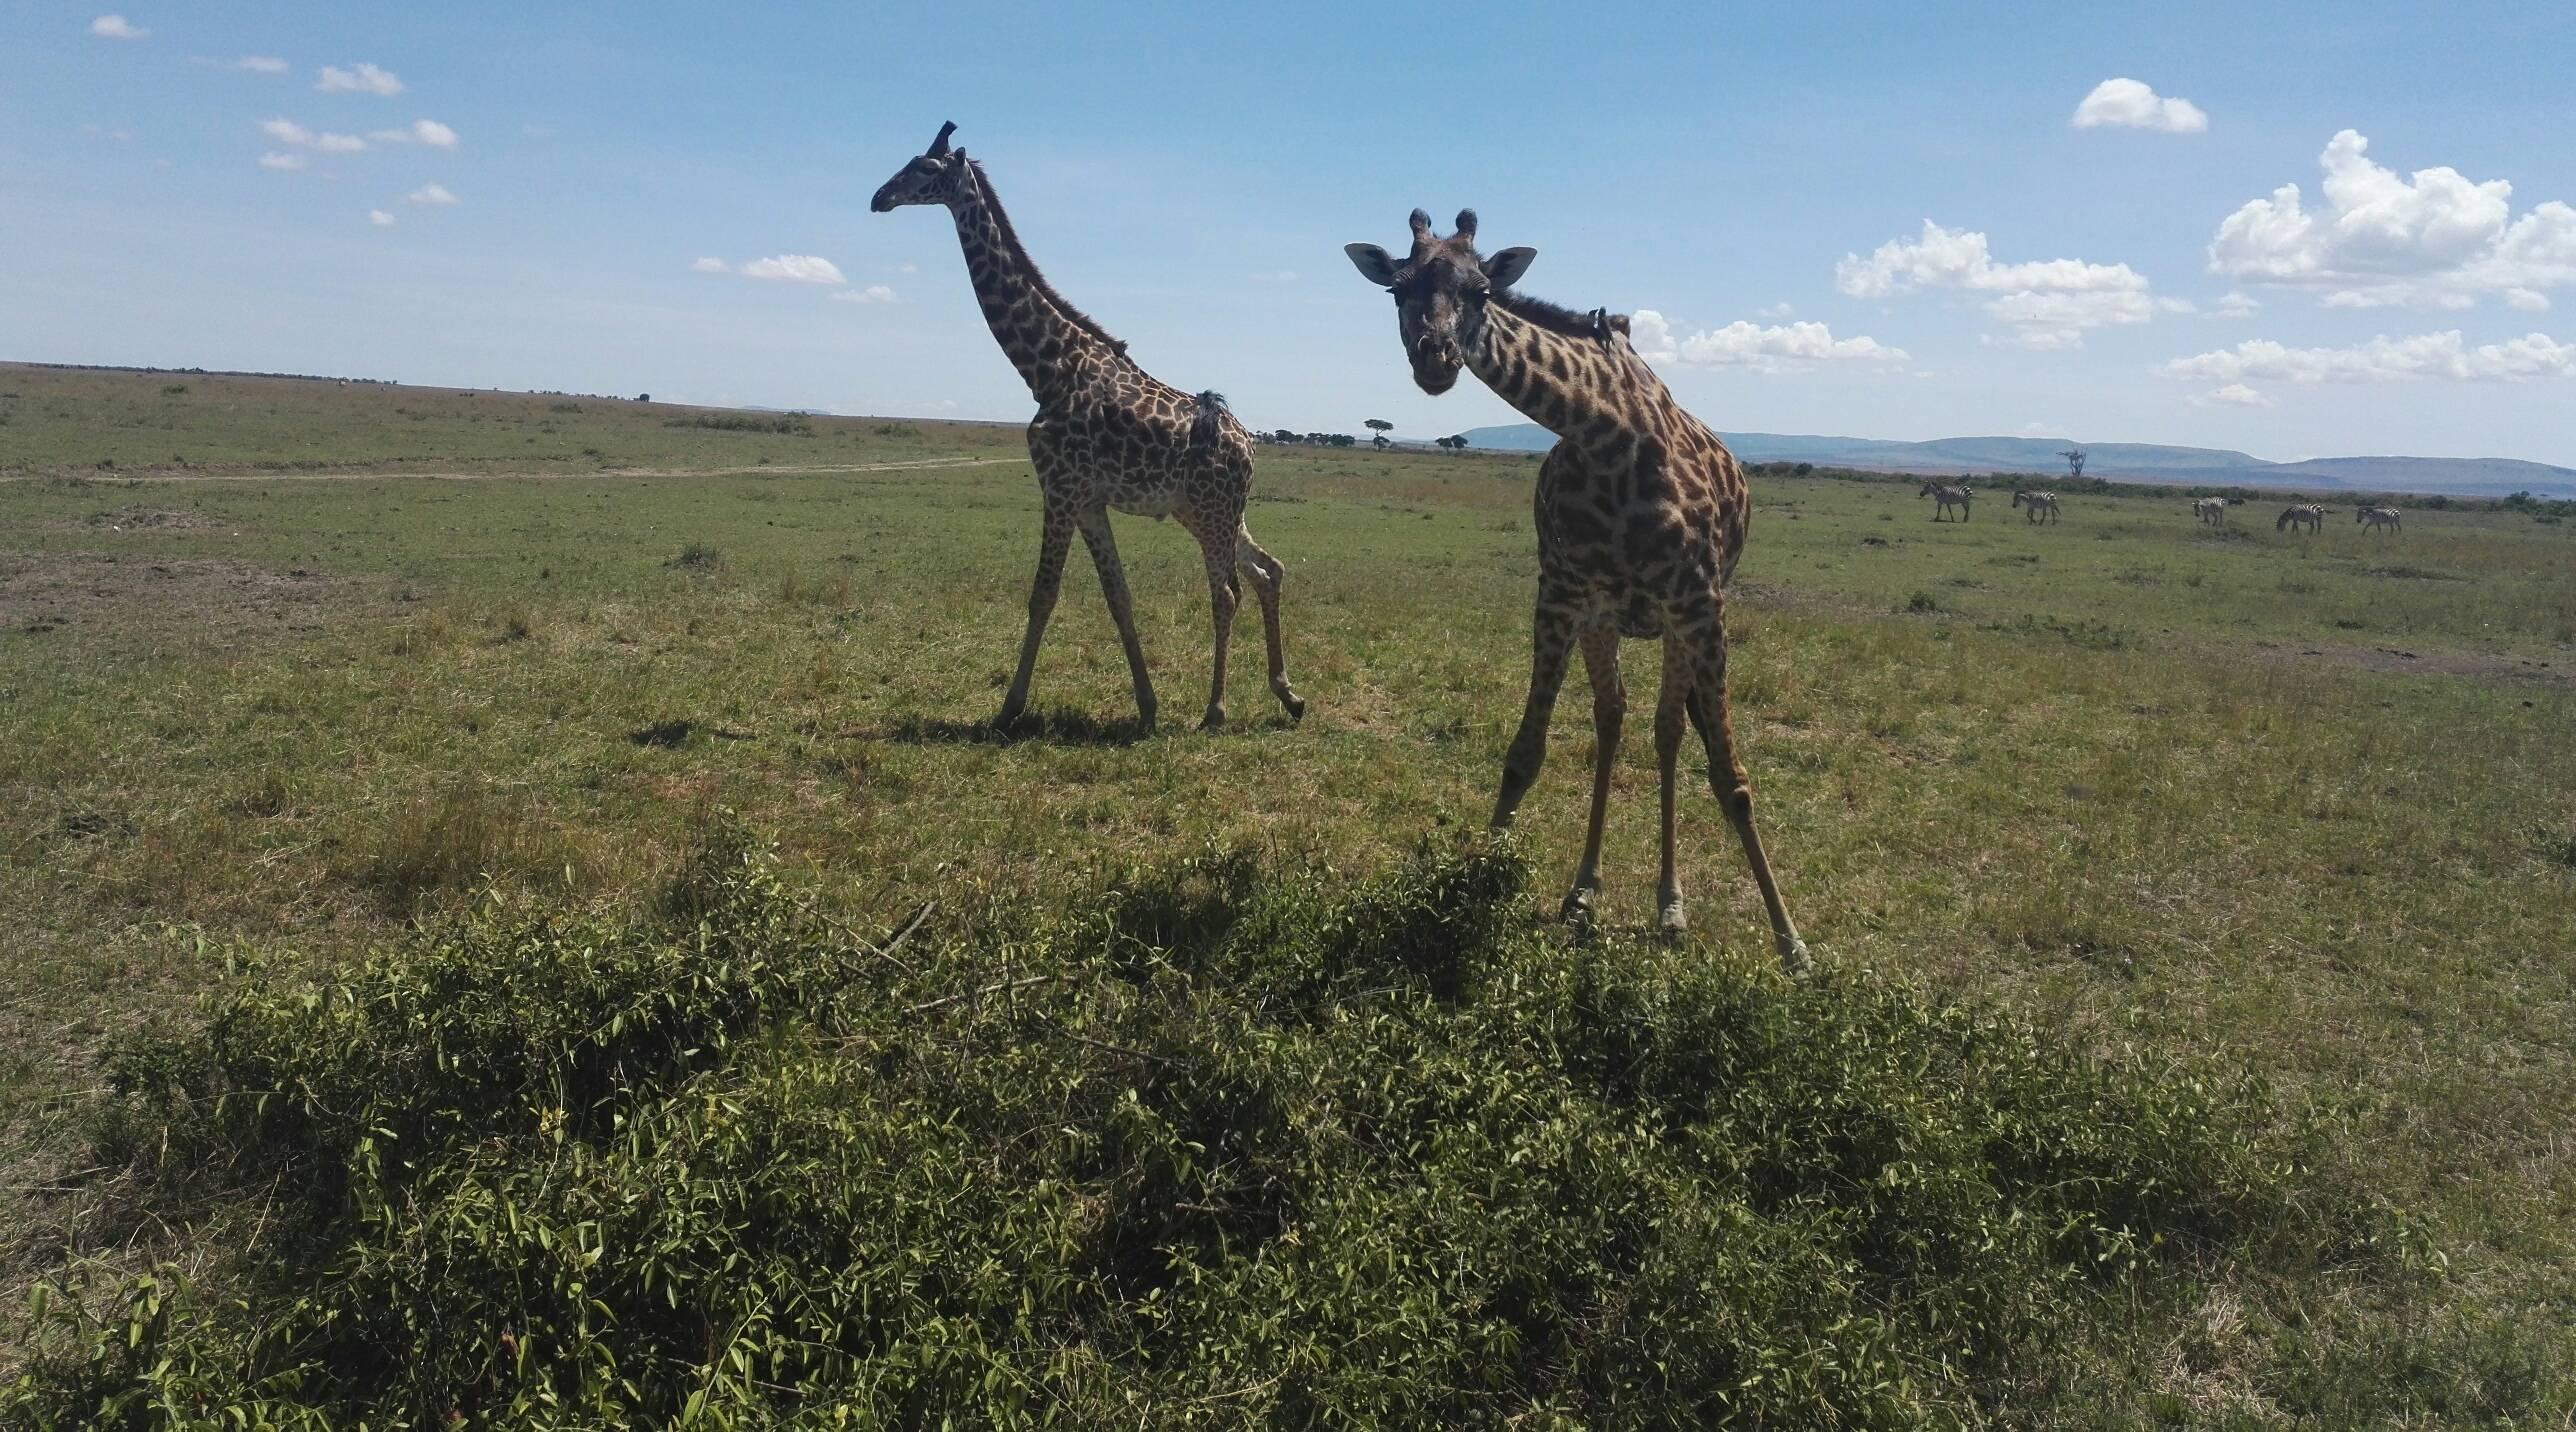 Photo 2: Parc national serengeti